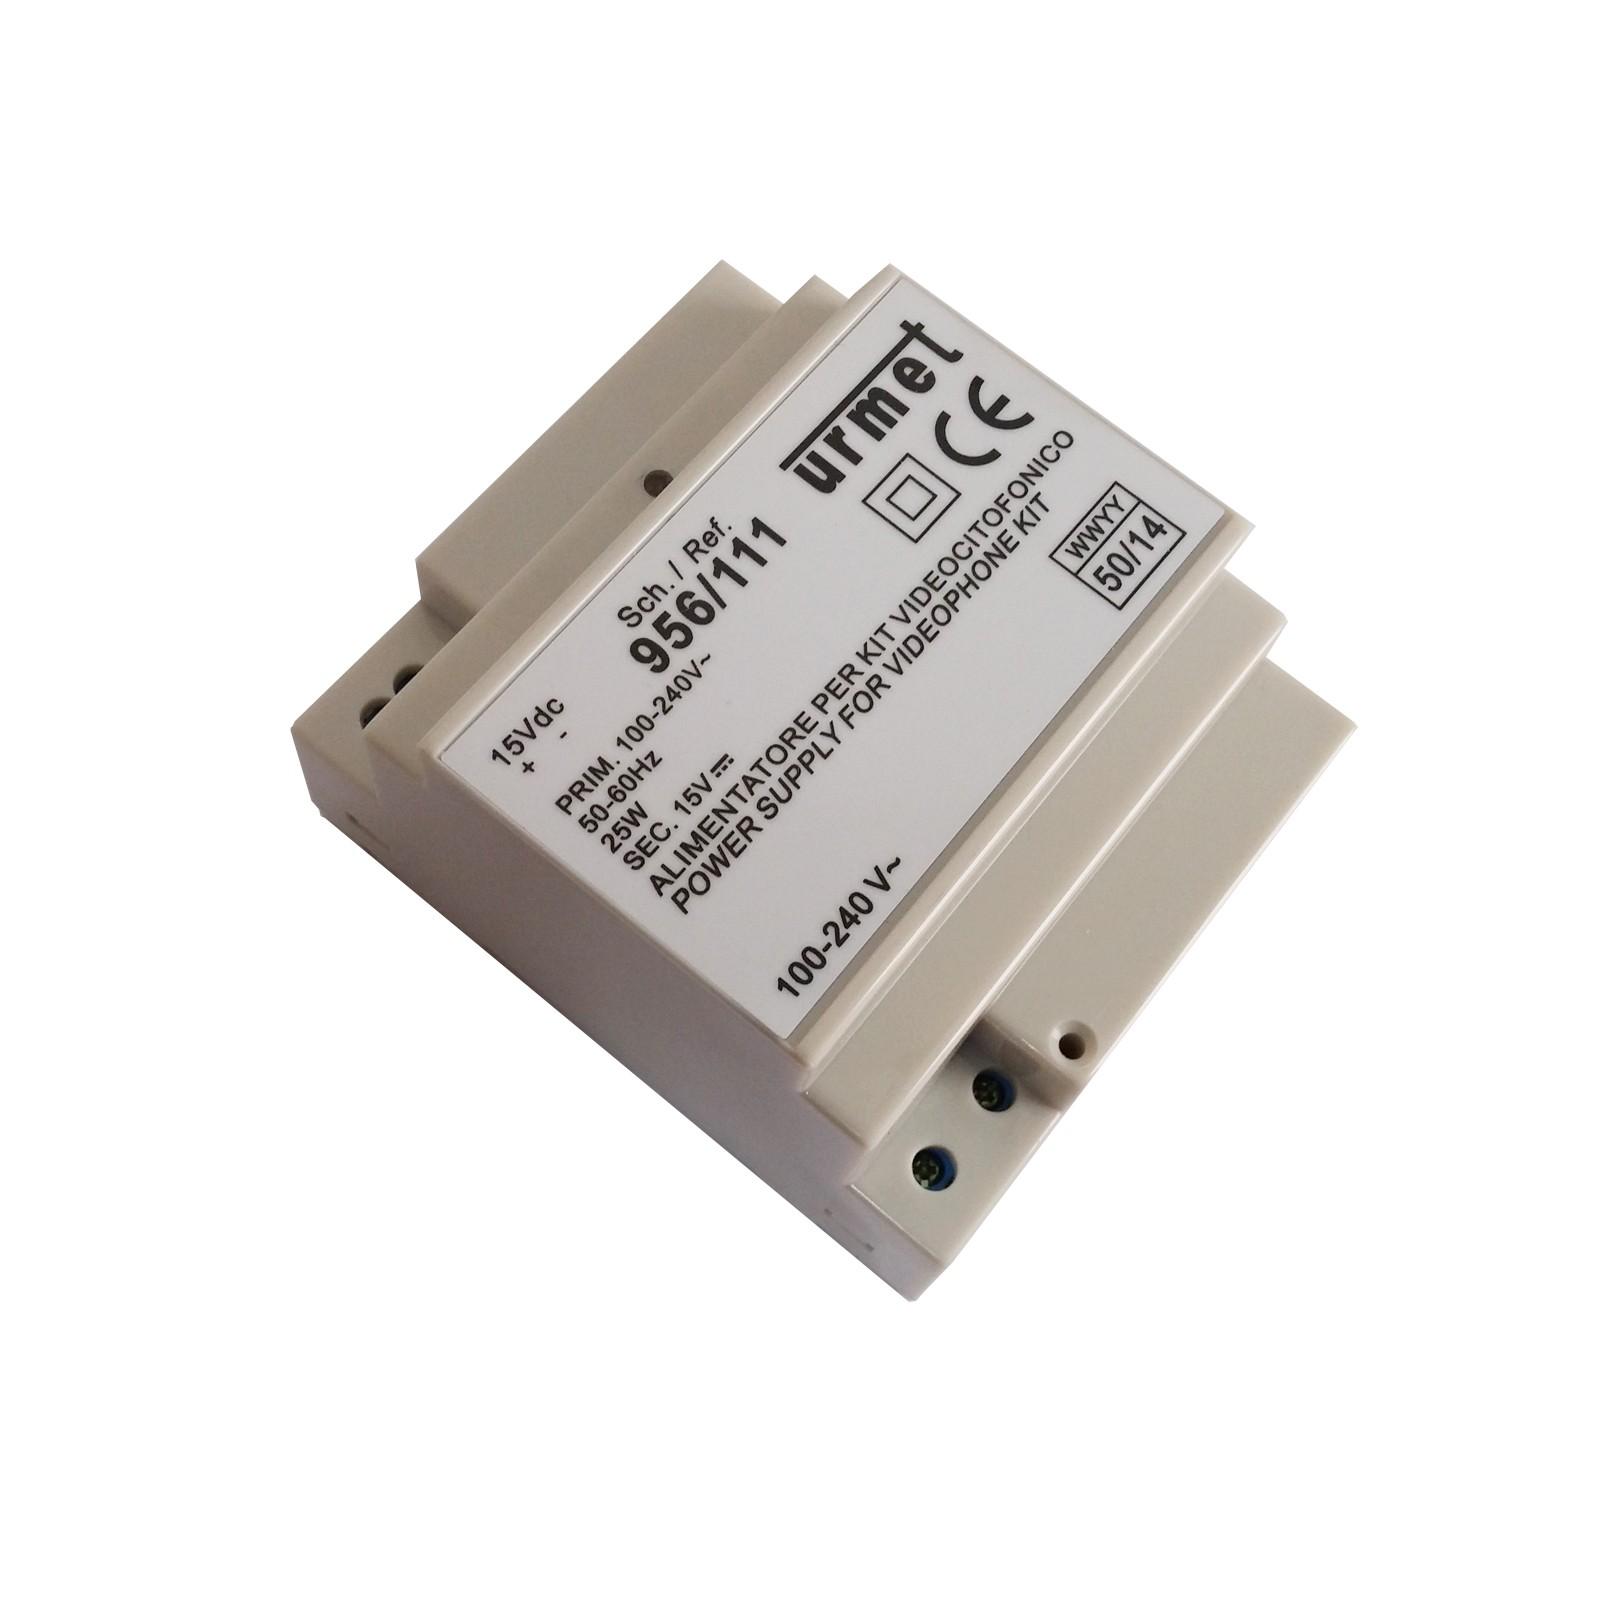 Schemi Elettrici Urmet : Kit videocitofono urmet simply mikra video monitor colori fili